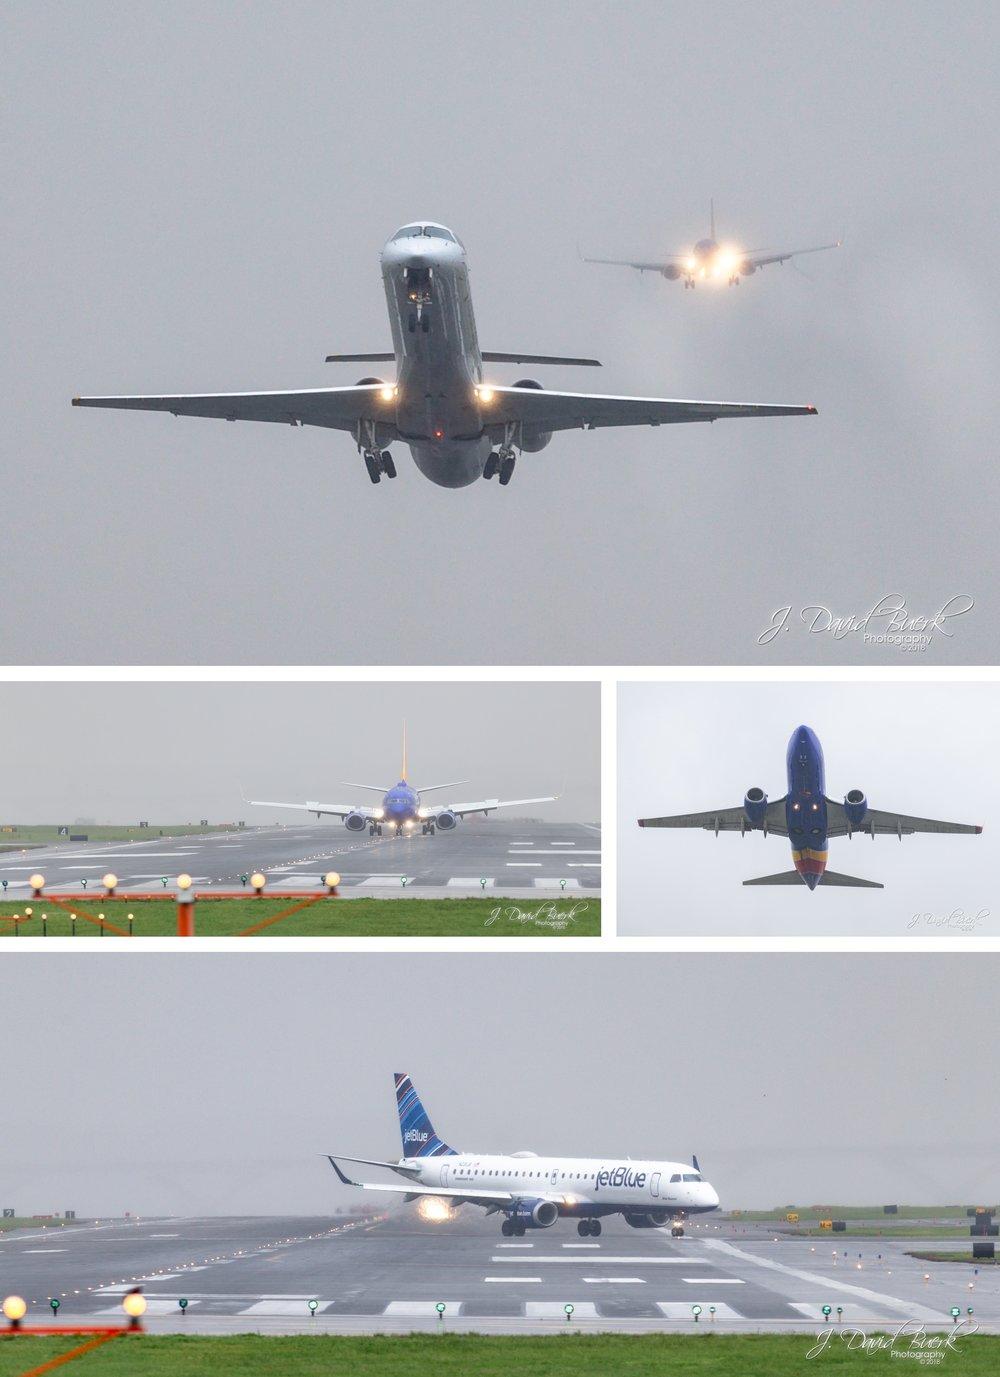 20180517 DCA Planespotting 1.jpg